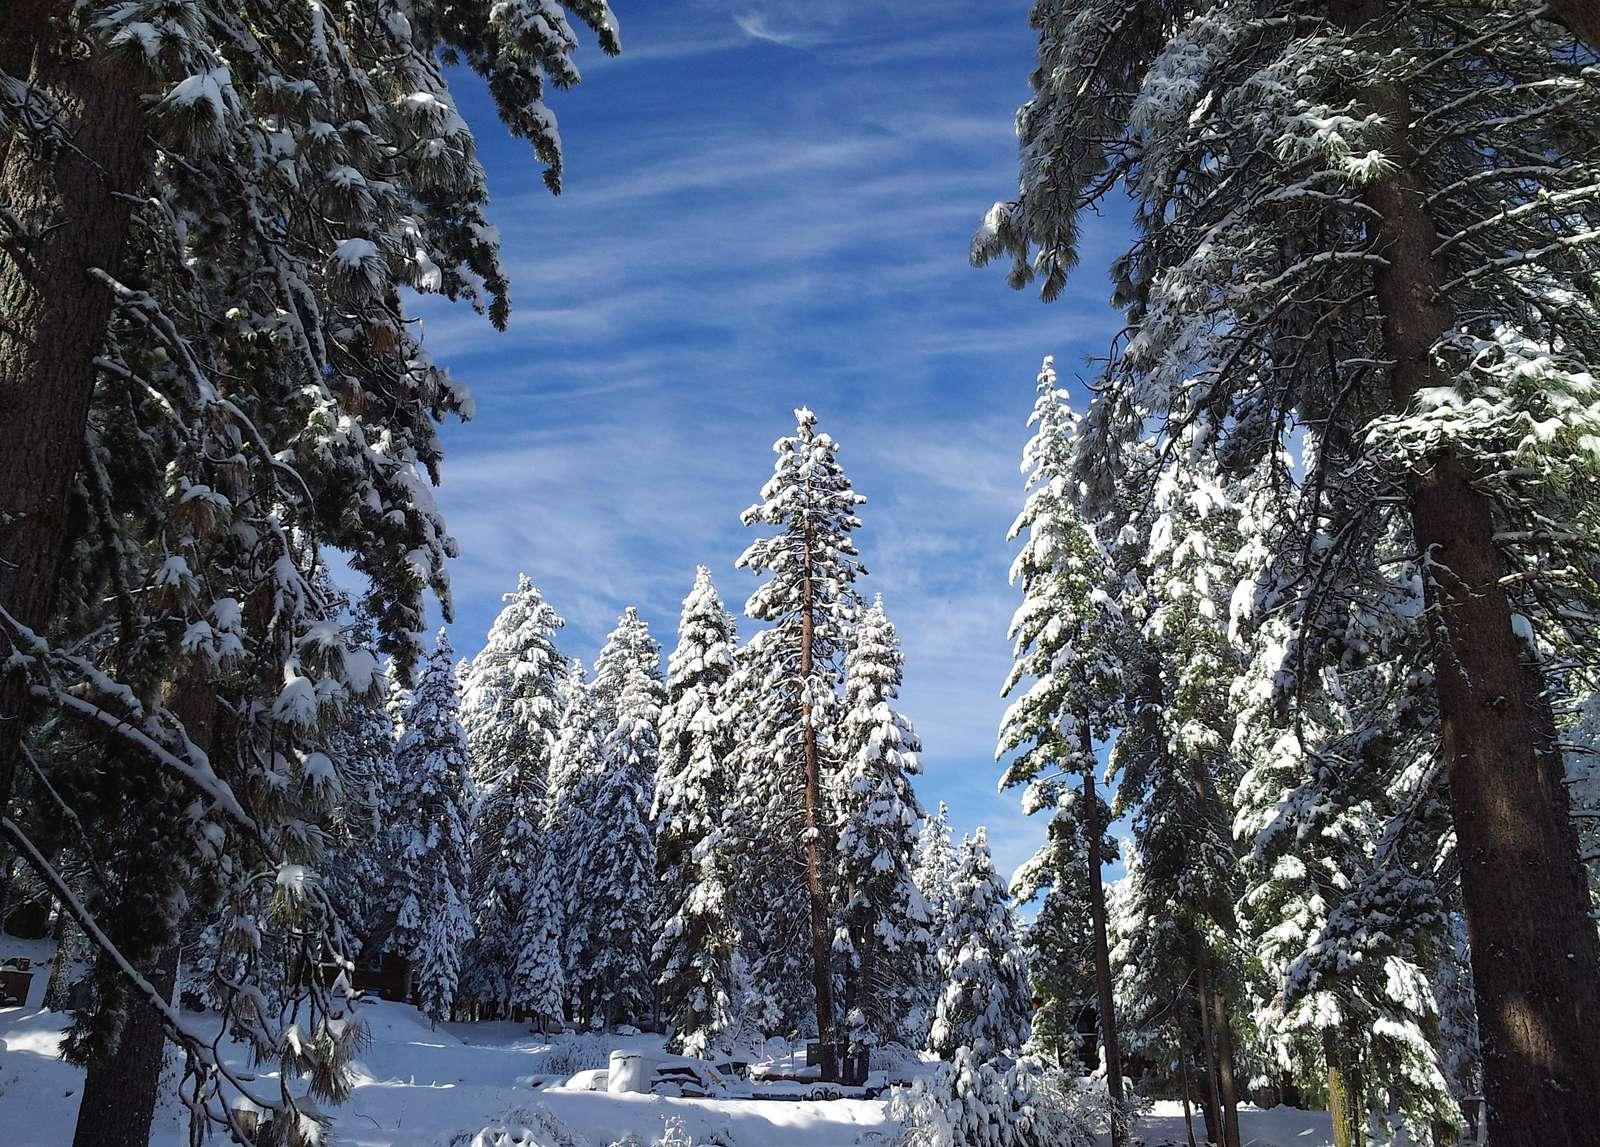 Patio Winter View